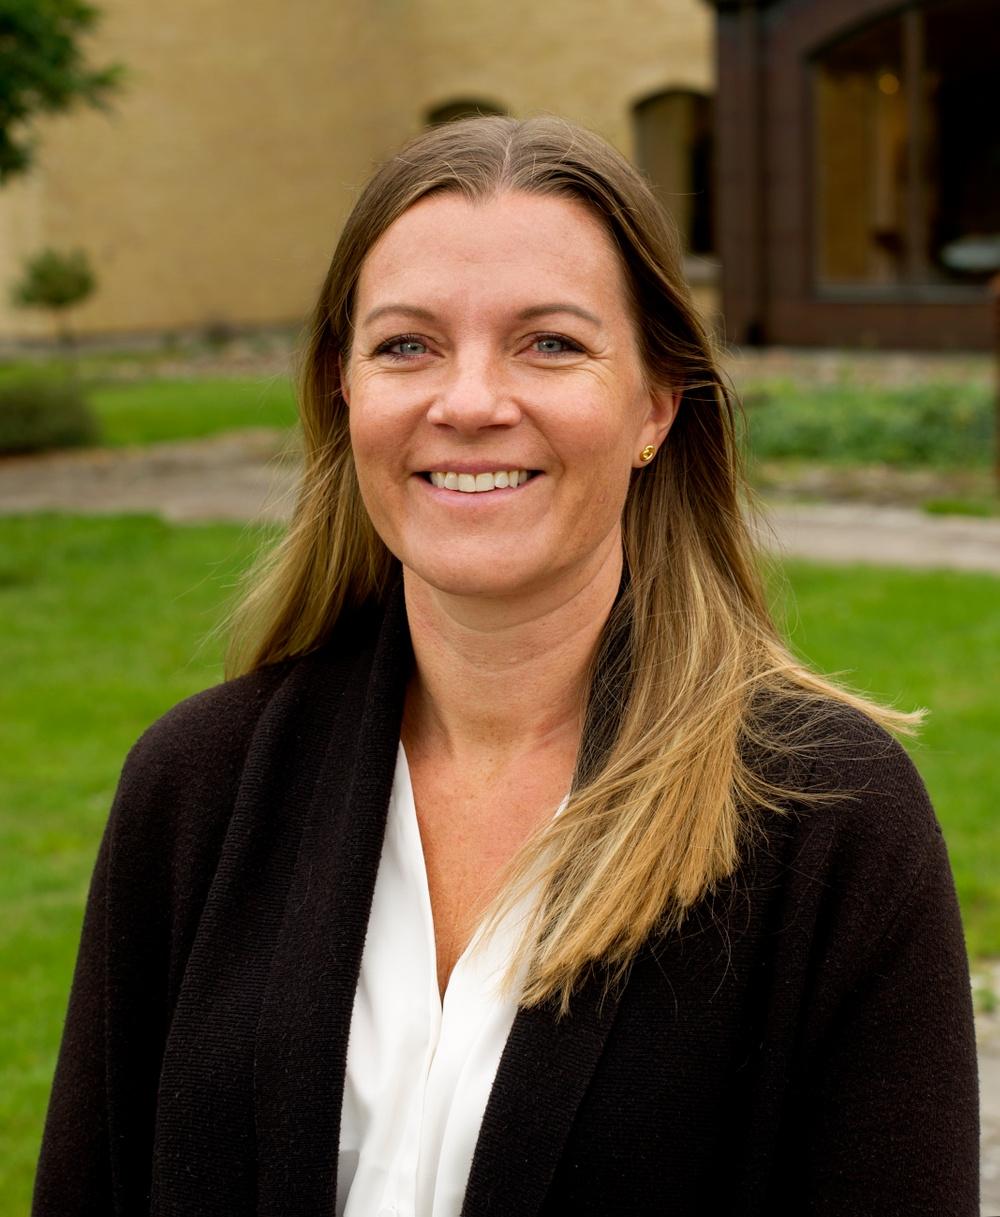 Johanna Wiechel Steier, kommunikationsdirektör